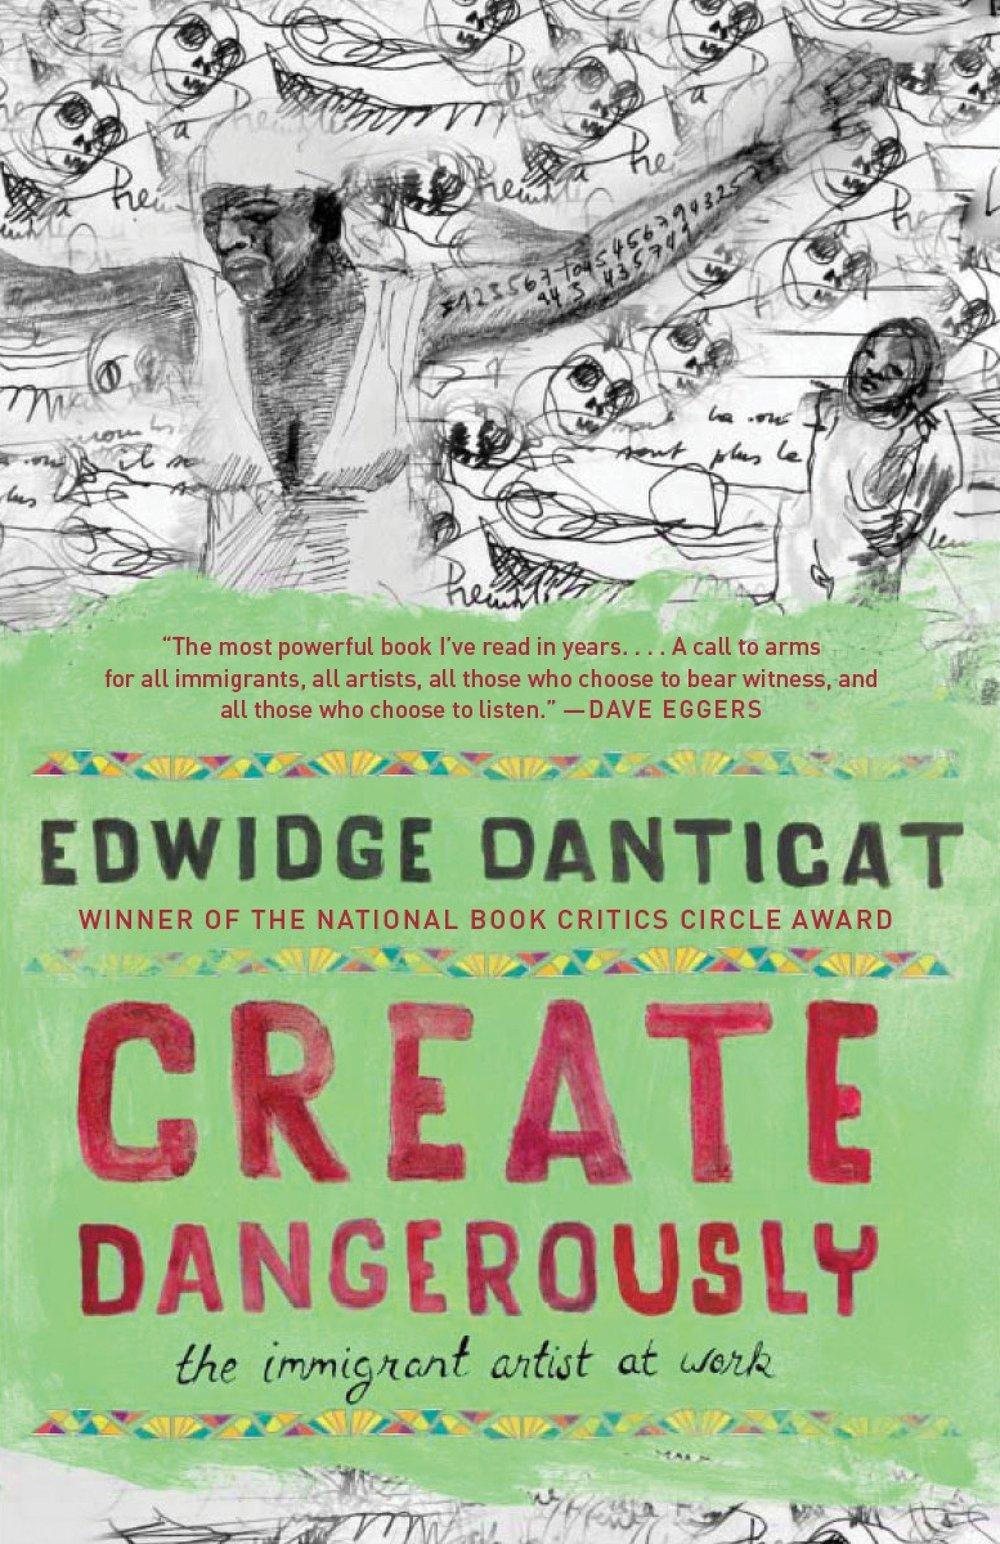 Edwidge Danticat / Create Dangerously; The inmigant artist at work / Vintage 2011 ( Haiti)